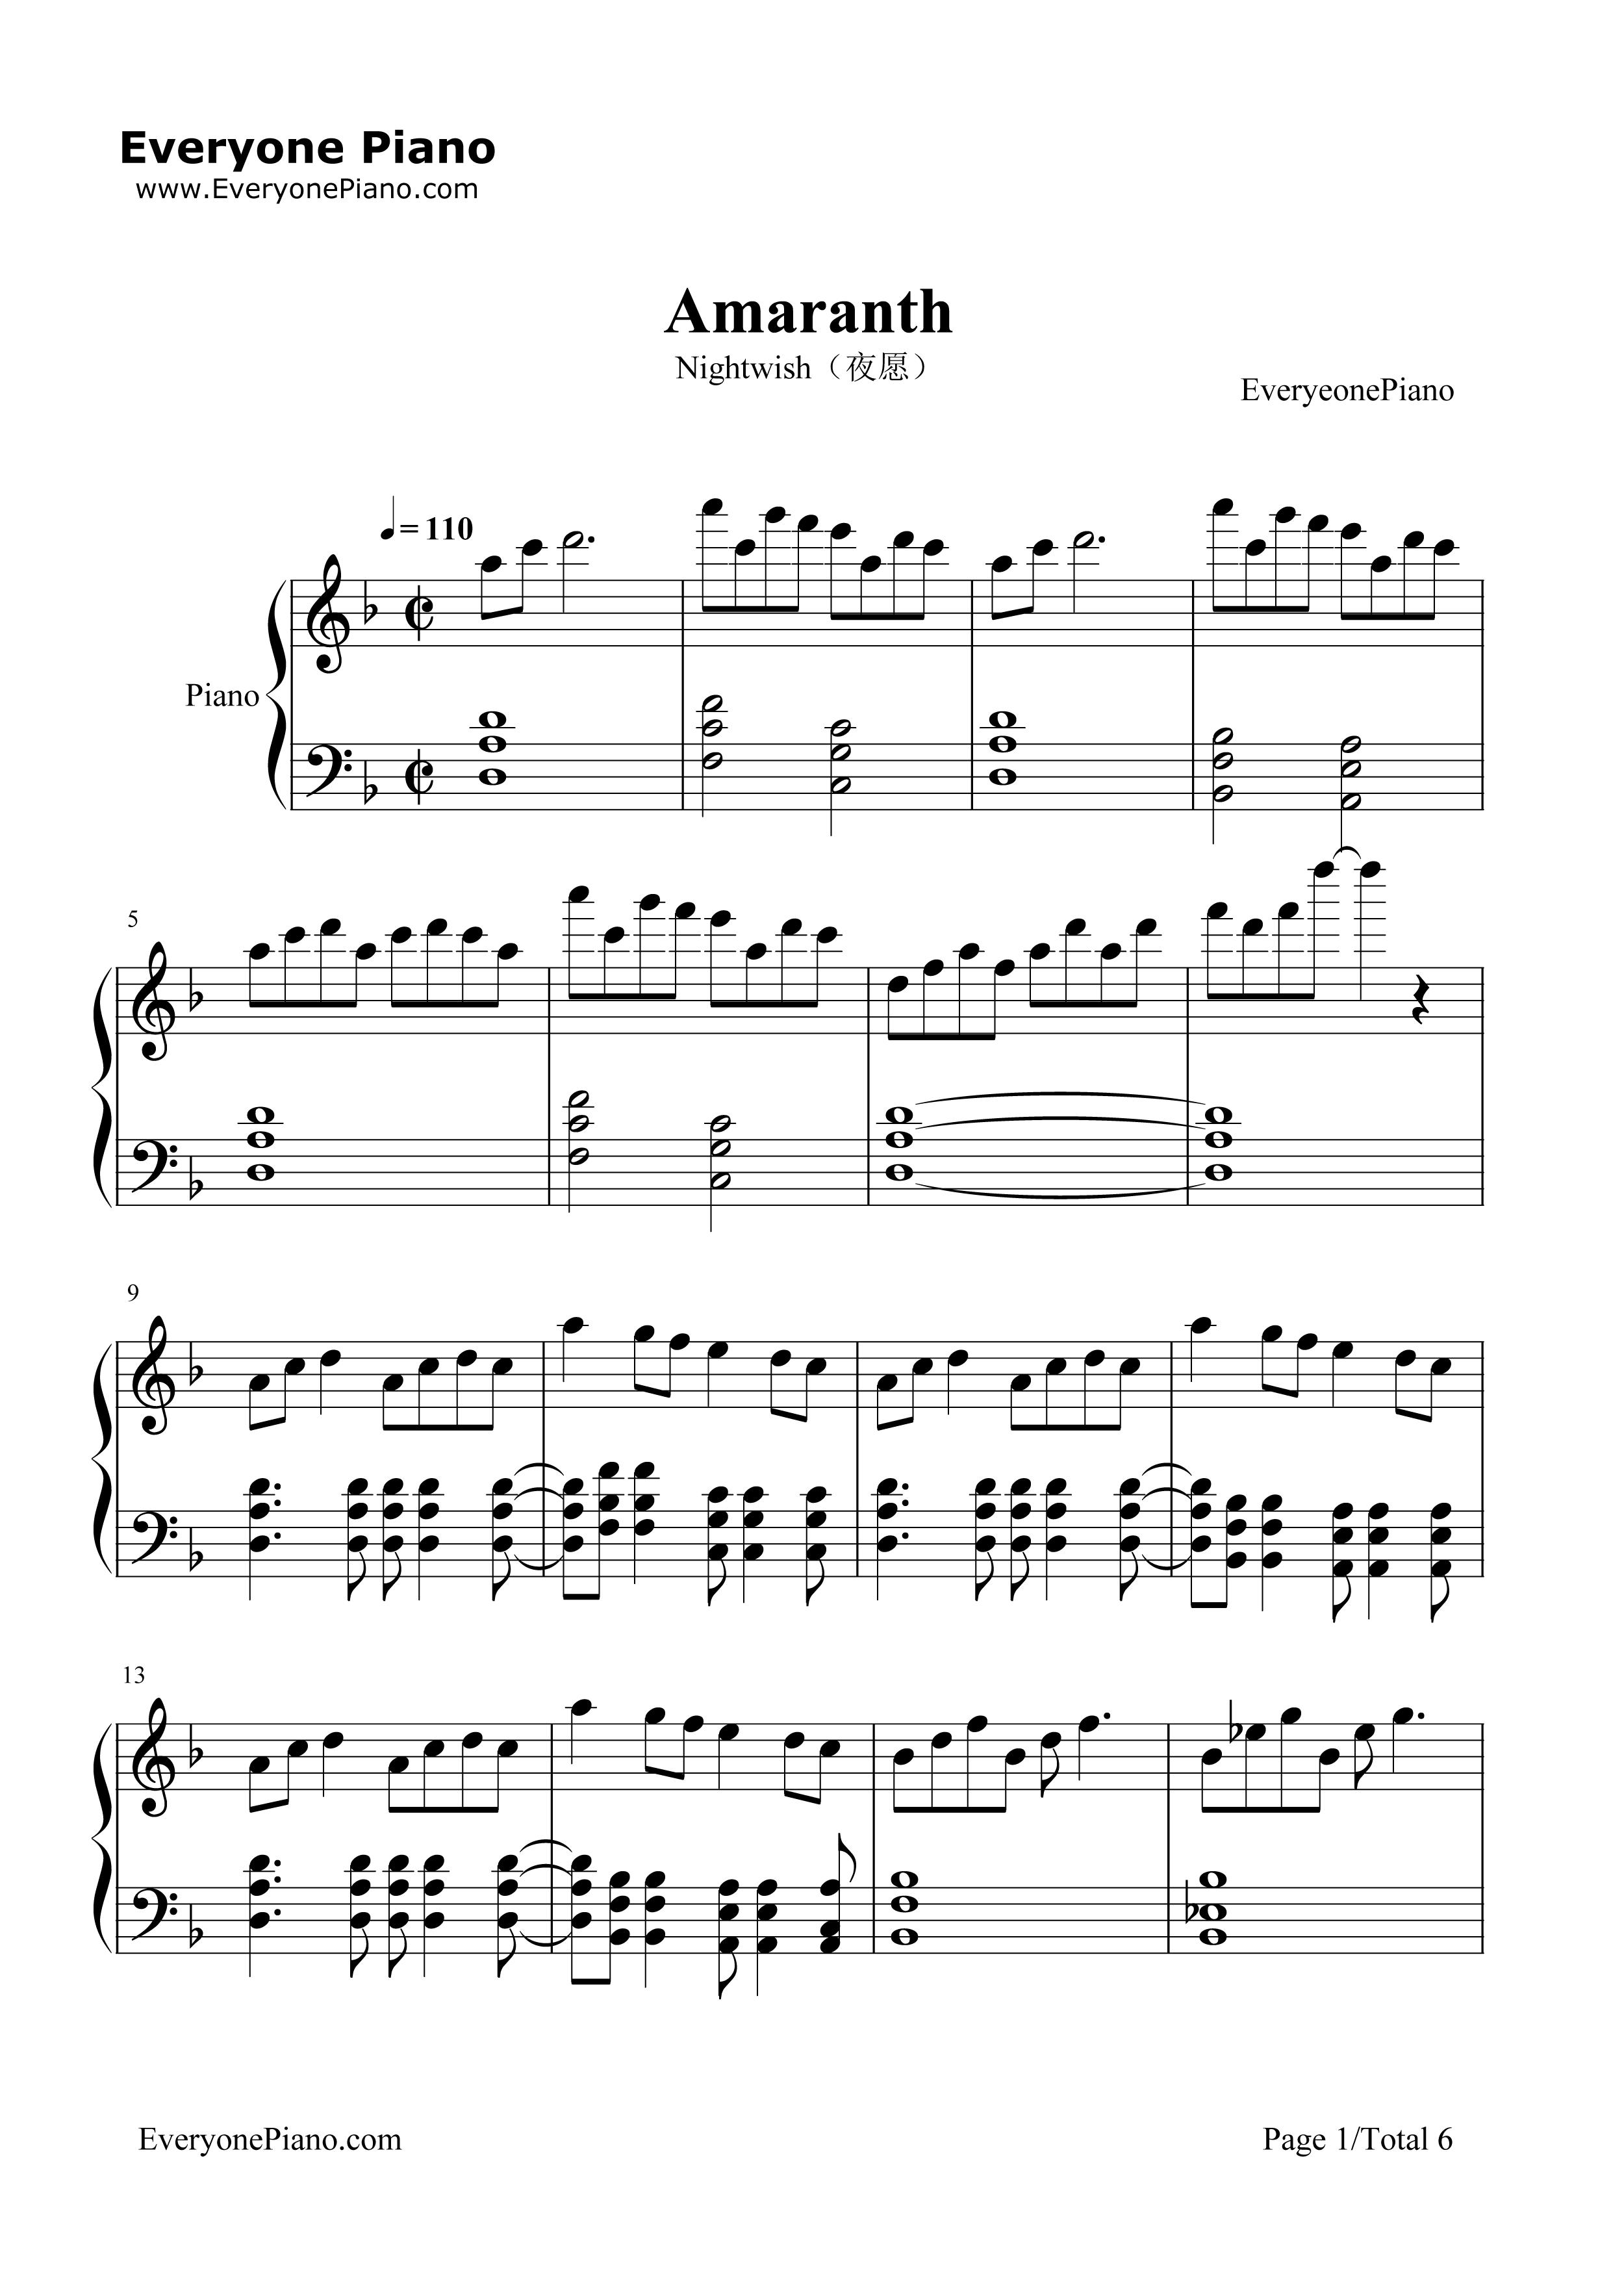 Amaranth nightwish stave preview 1 free piano sheet music piano listen now print sheet amaranth nightwish stave preview 1 hexwebz Gallery